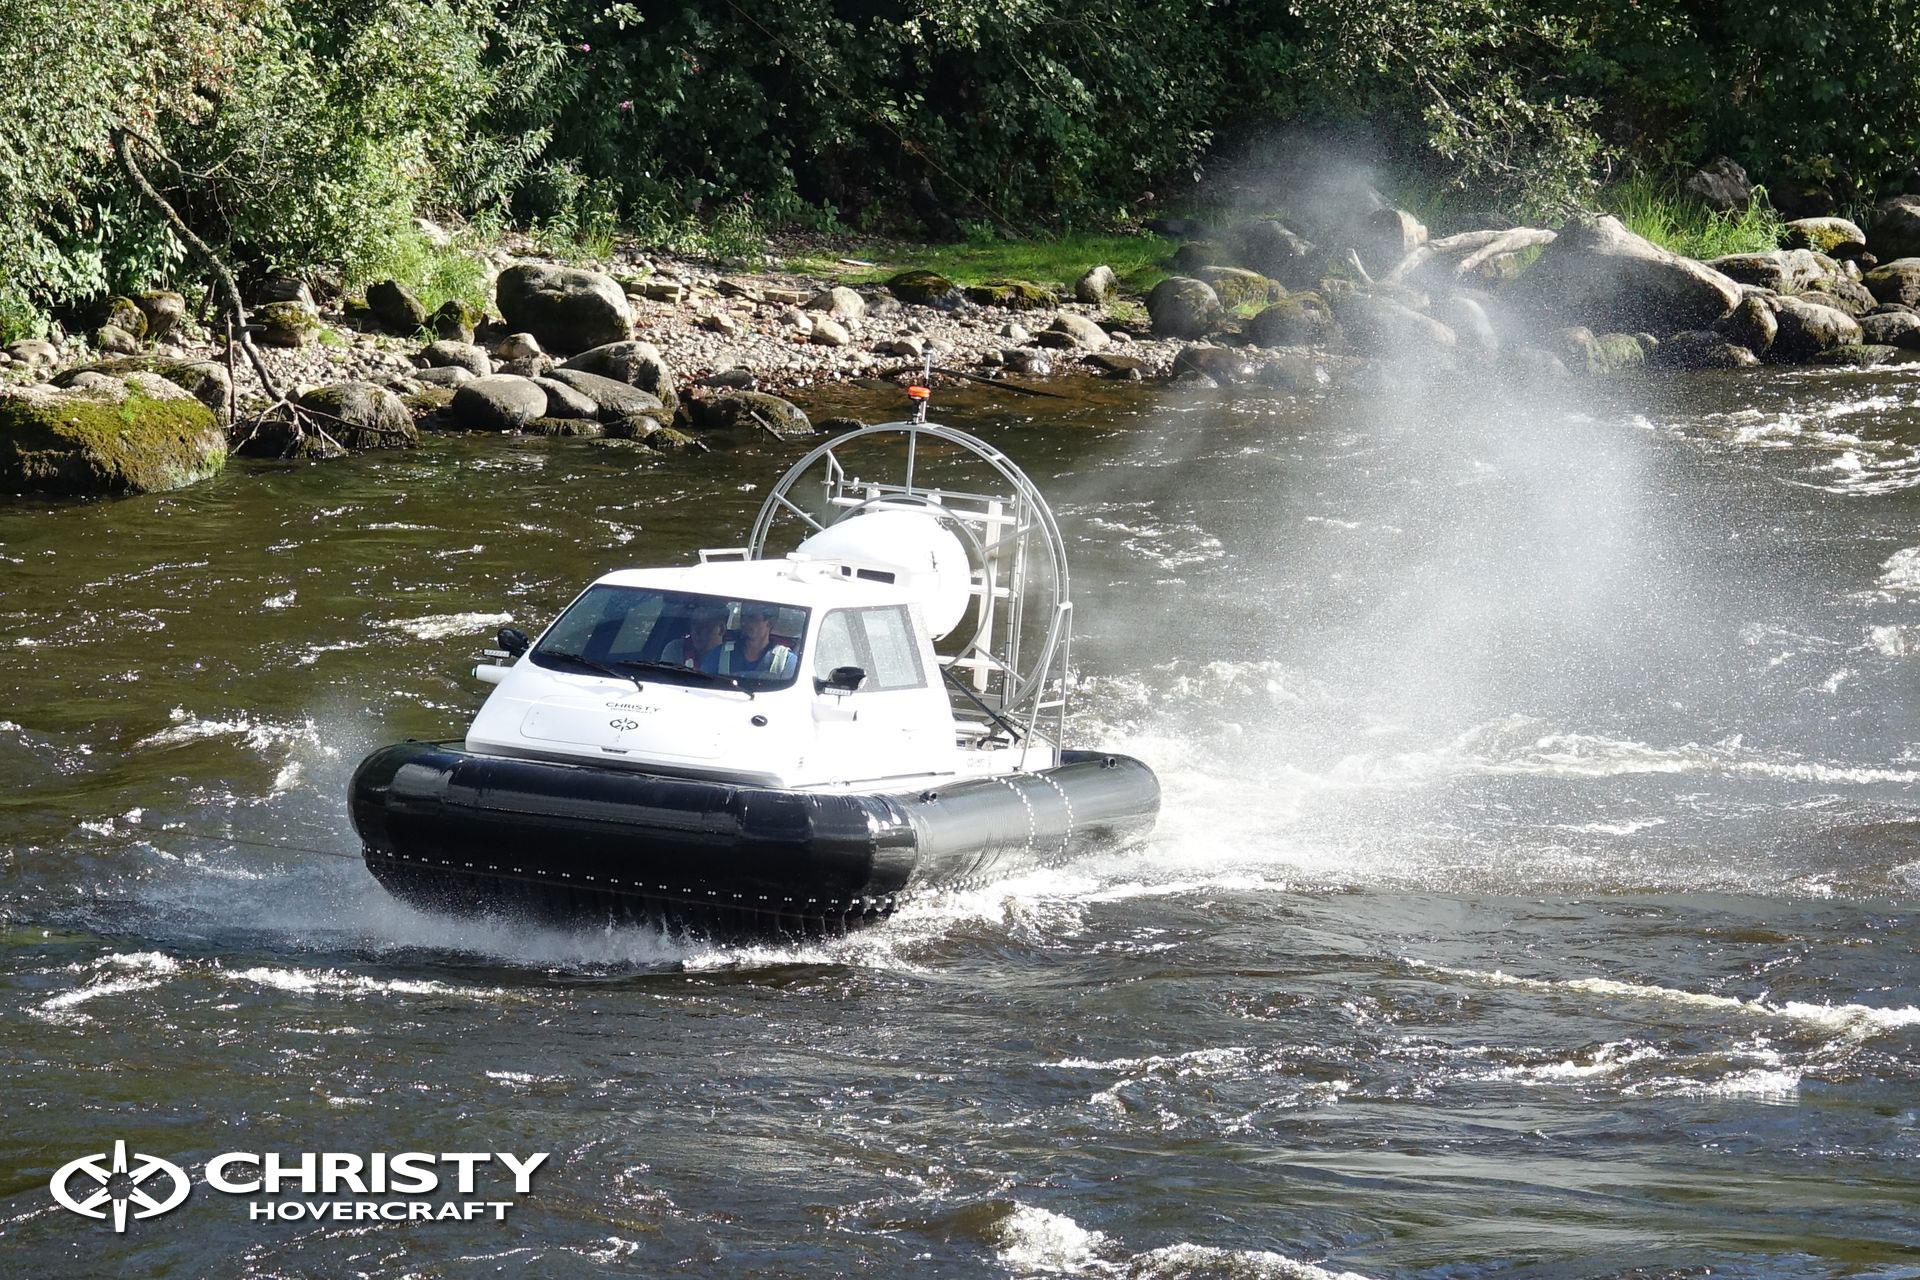 Hovercraft-Christy-5146-FC-27.jpg | фото №25